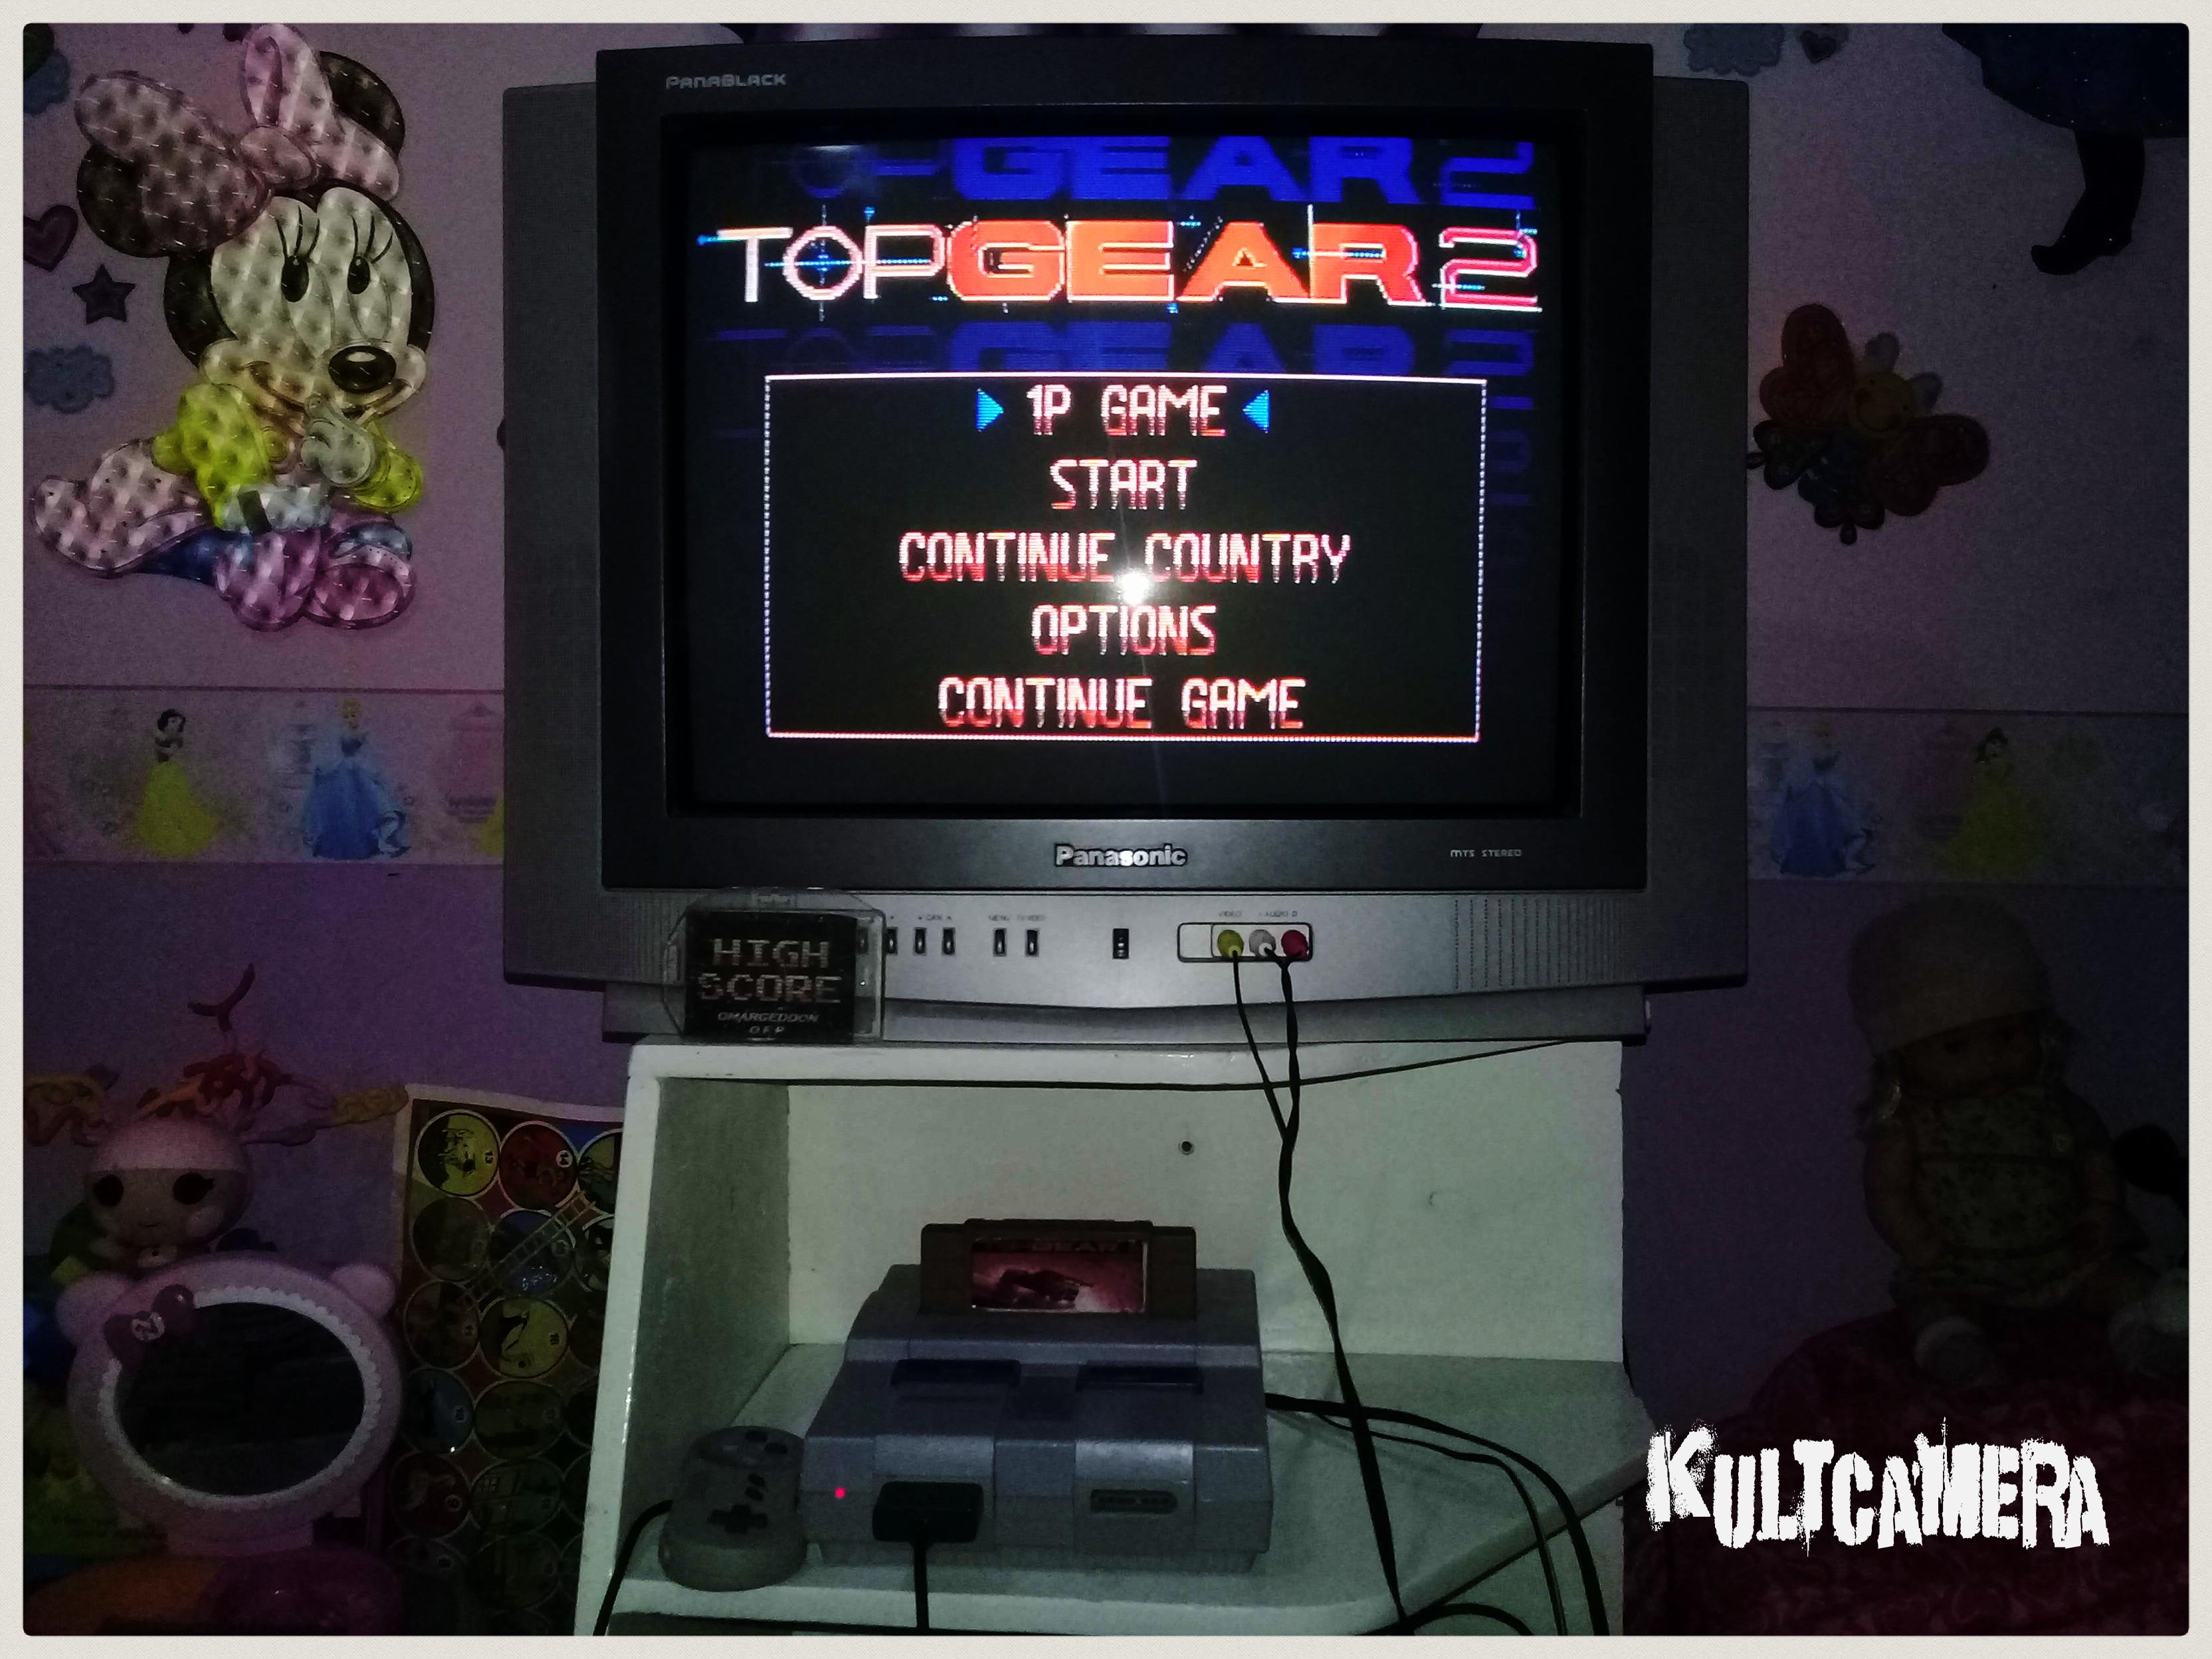 omargeddon: Top Gear 2: Australasia: Canterbury Plains [Amateur / Nitro Allowed] (SNES/Super Famicom) 0:02:50.89 points on 2019-07-14 12:58:03